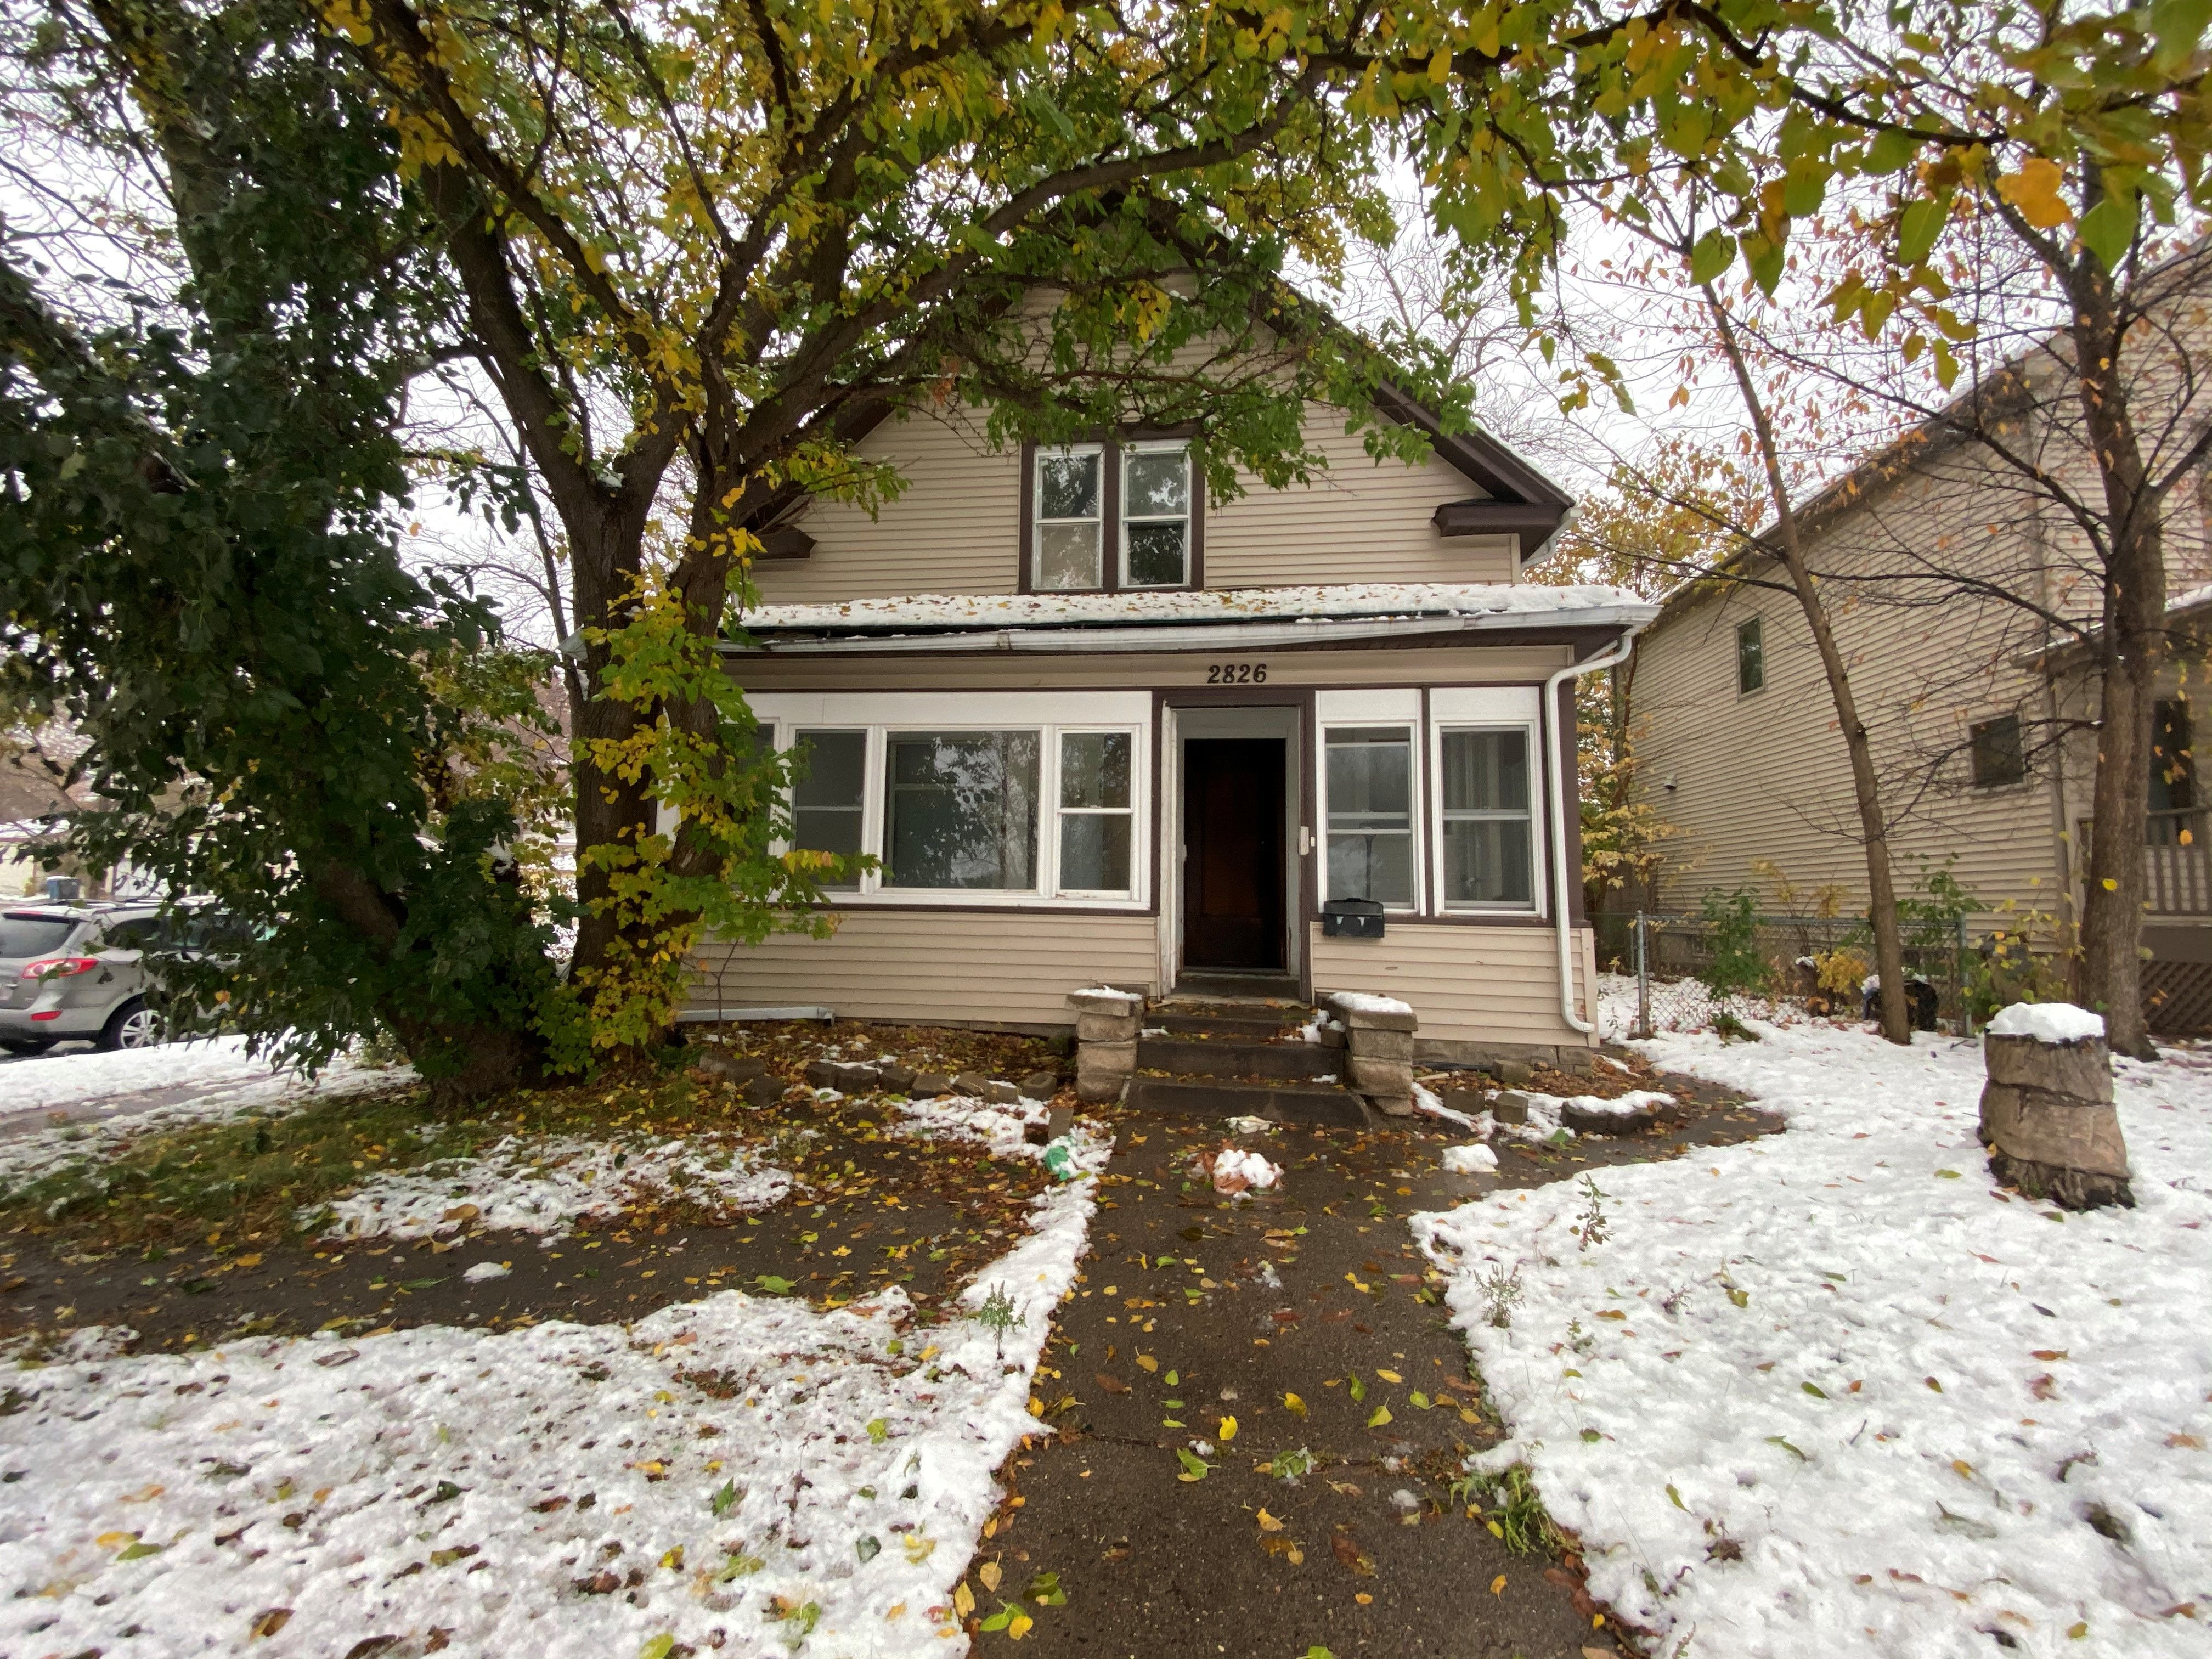 2826 N Humboldt Ave (Image - 1)